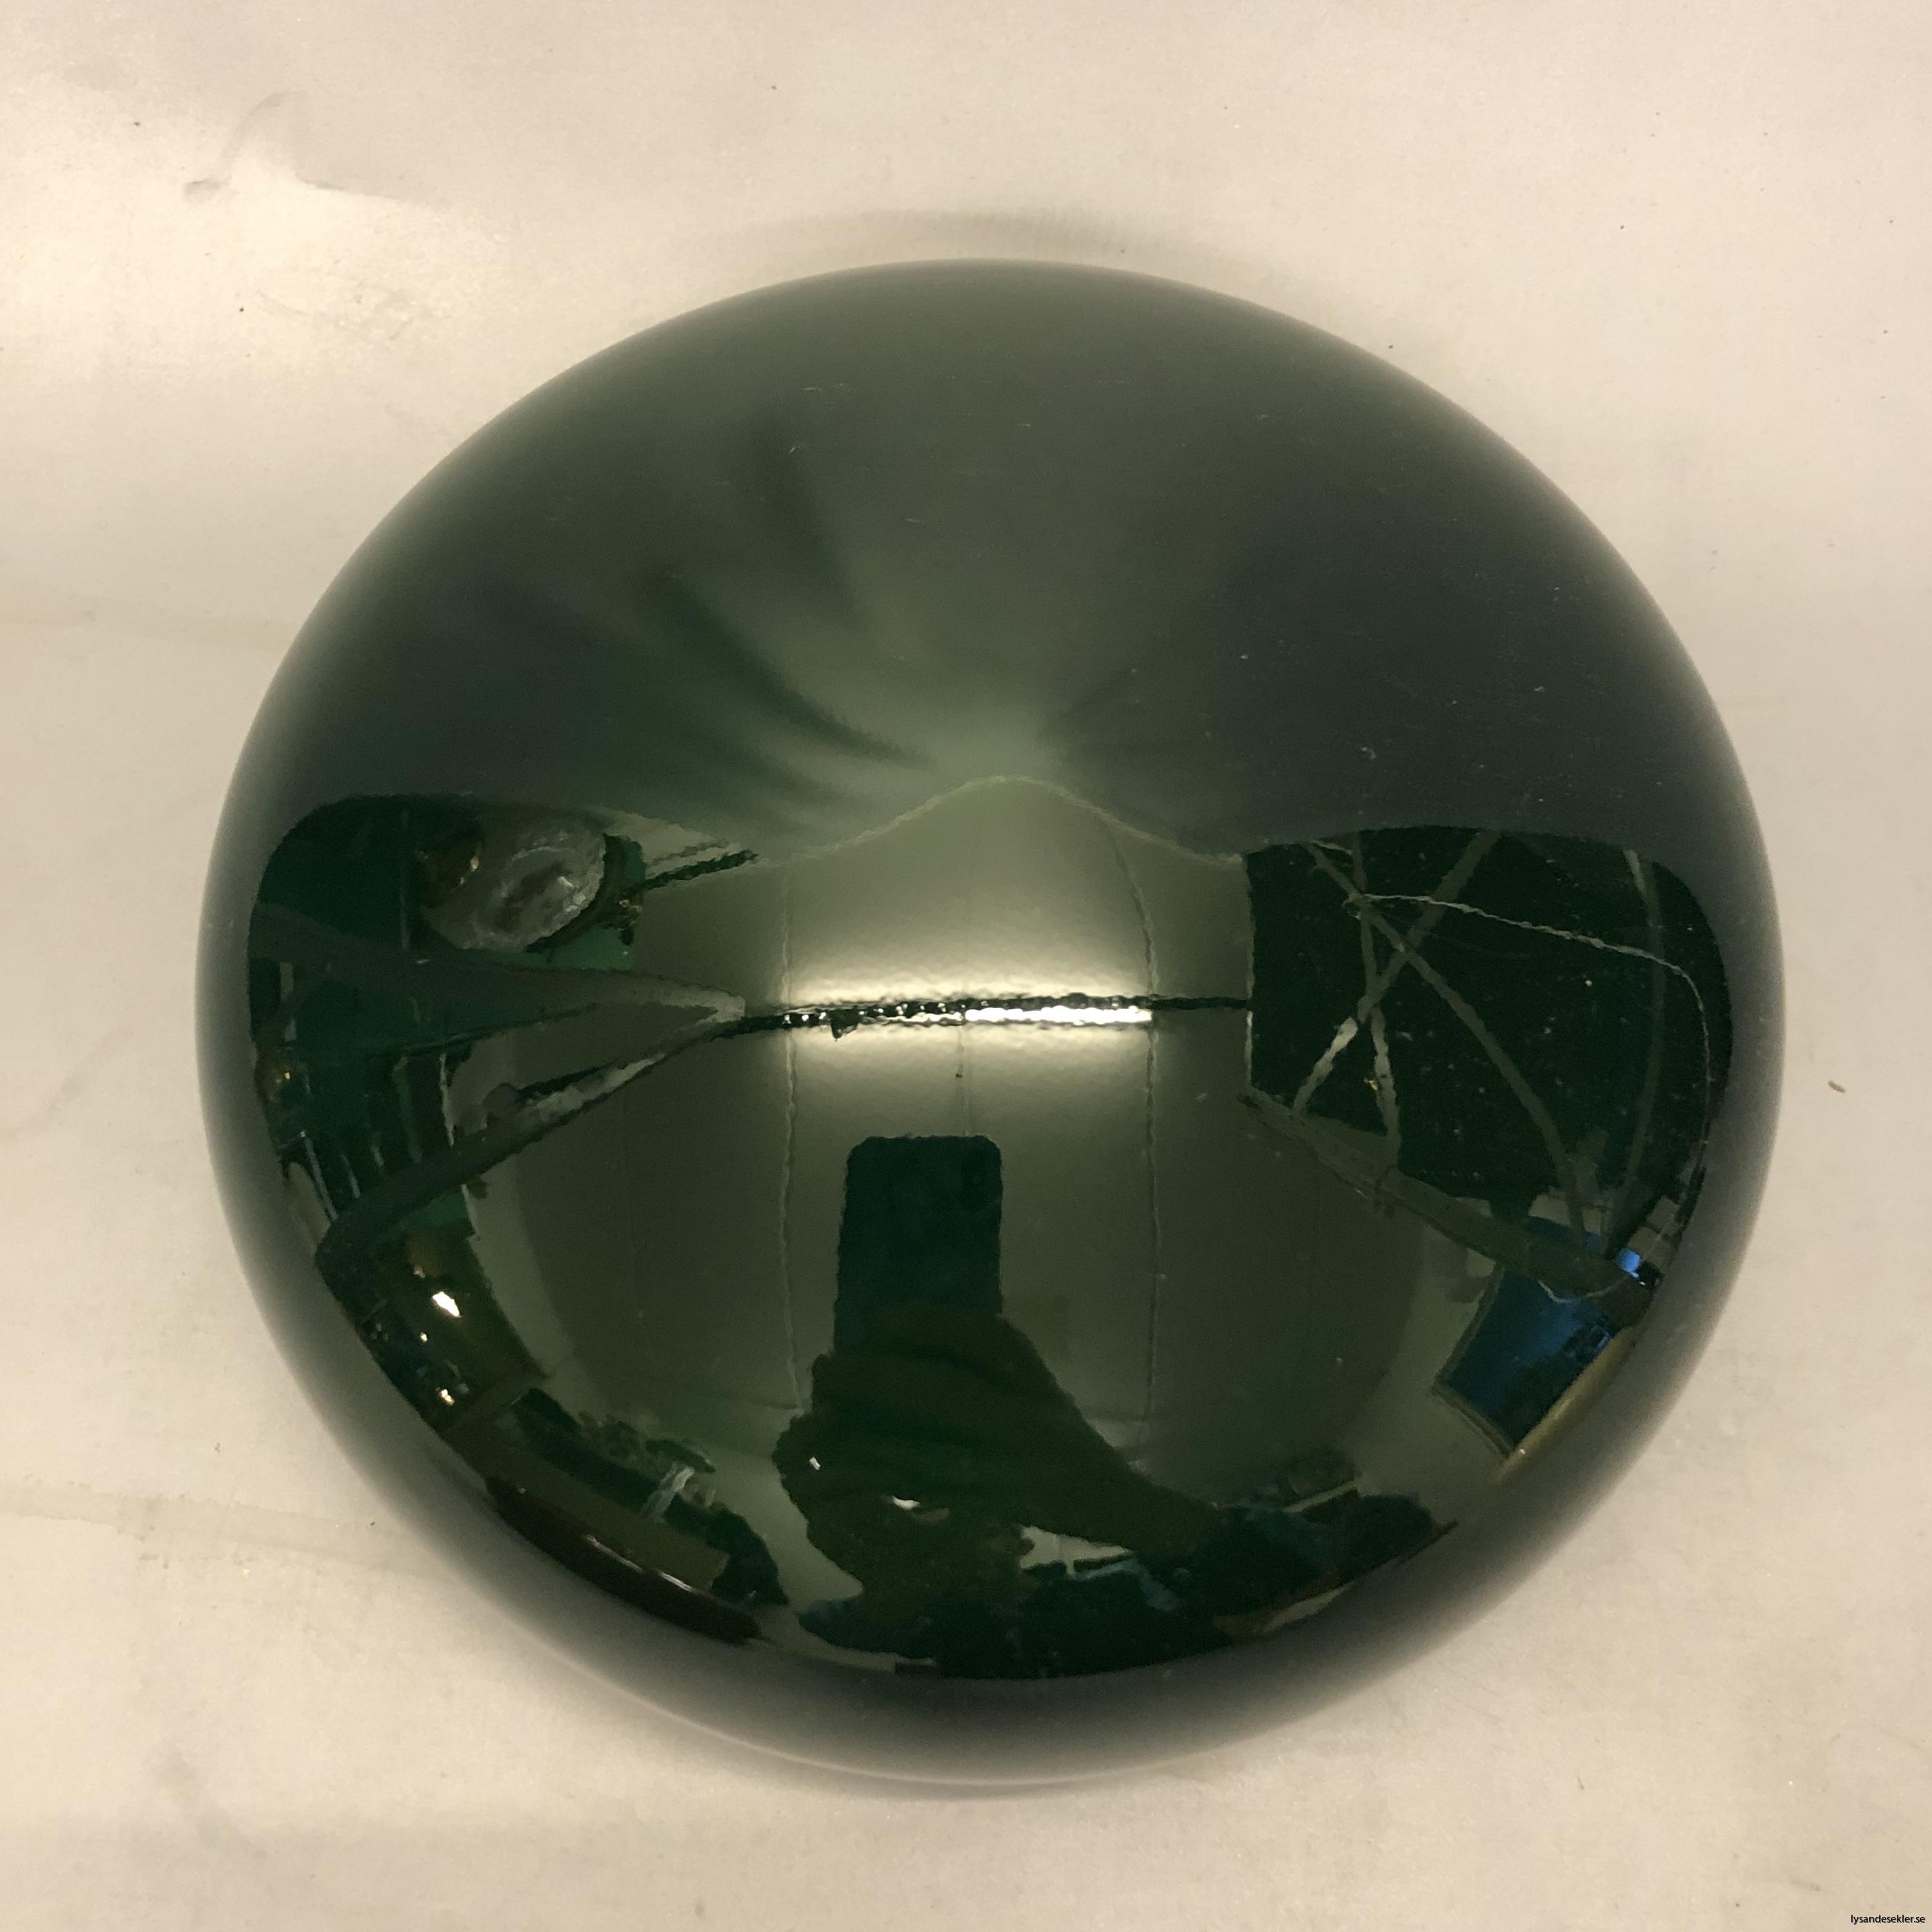 strindbergsskärm 170 mm kupa till strindbergslampa9